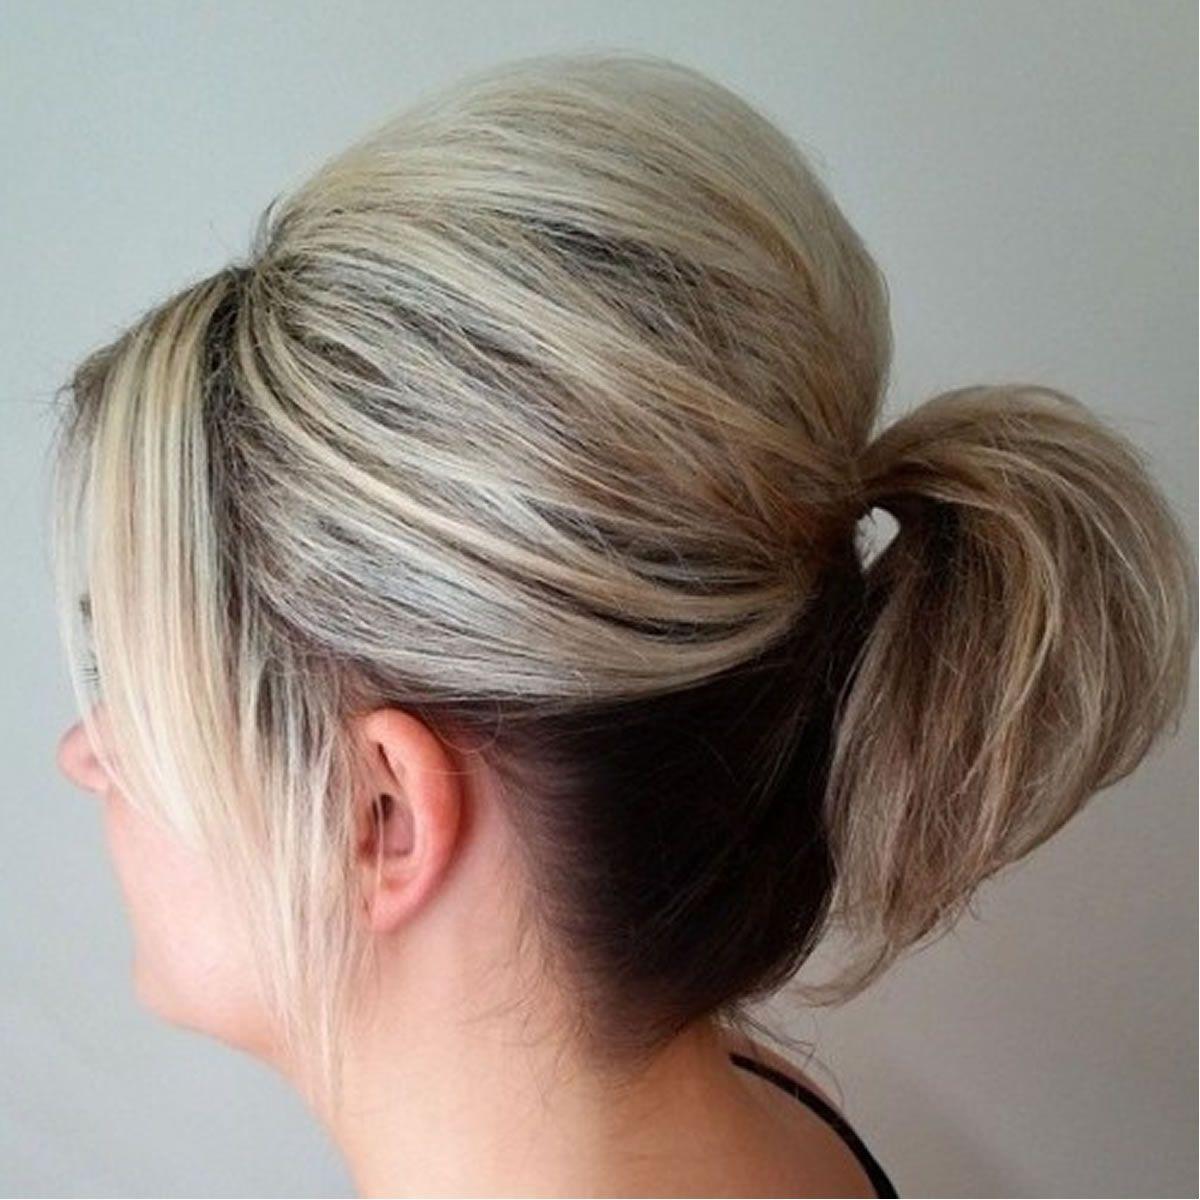 Kreative Haarfarbe Ideen Fur Mittellanges Haar Pferdeschwanz Fur